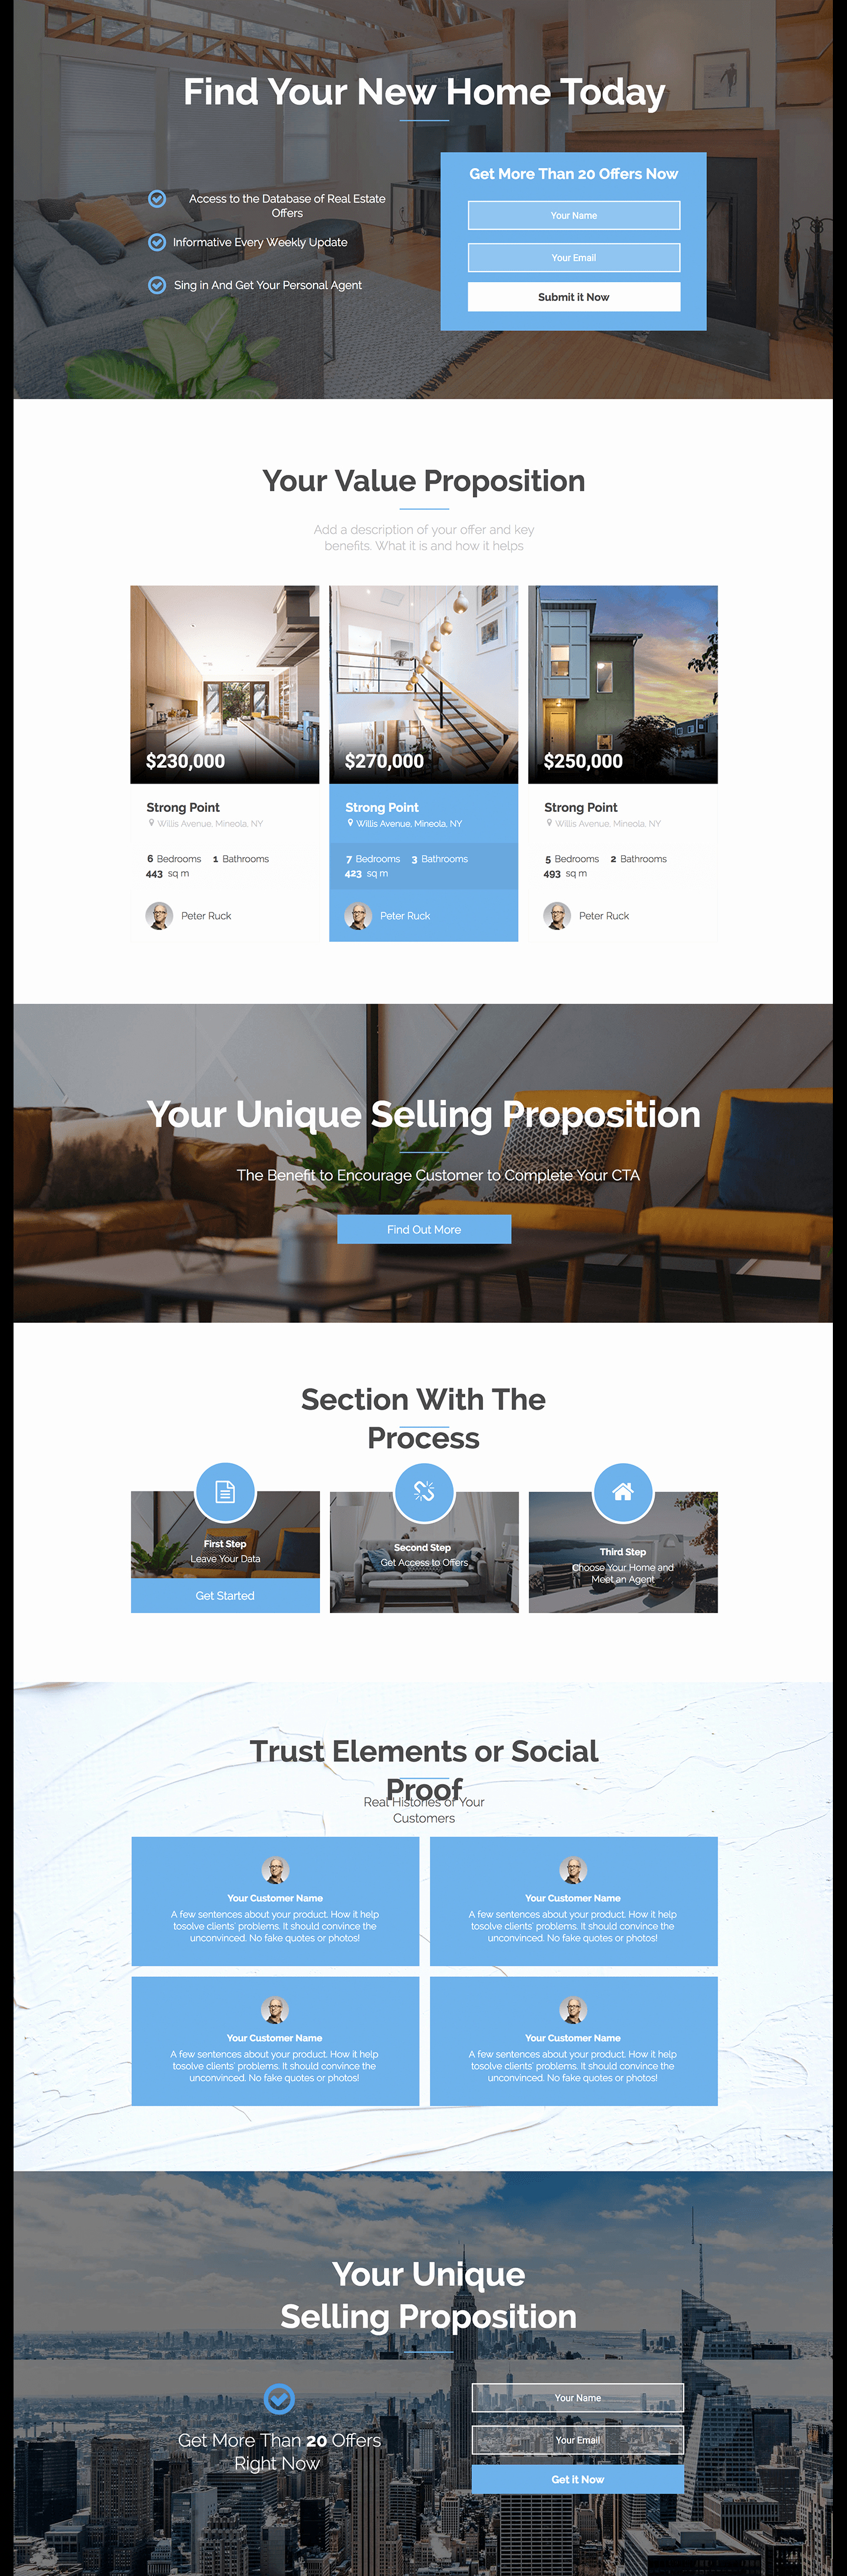 Free Real Estate Newsletter Templates Elegant Real Estate Newsletter Landing Page Template